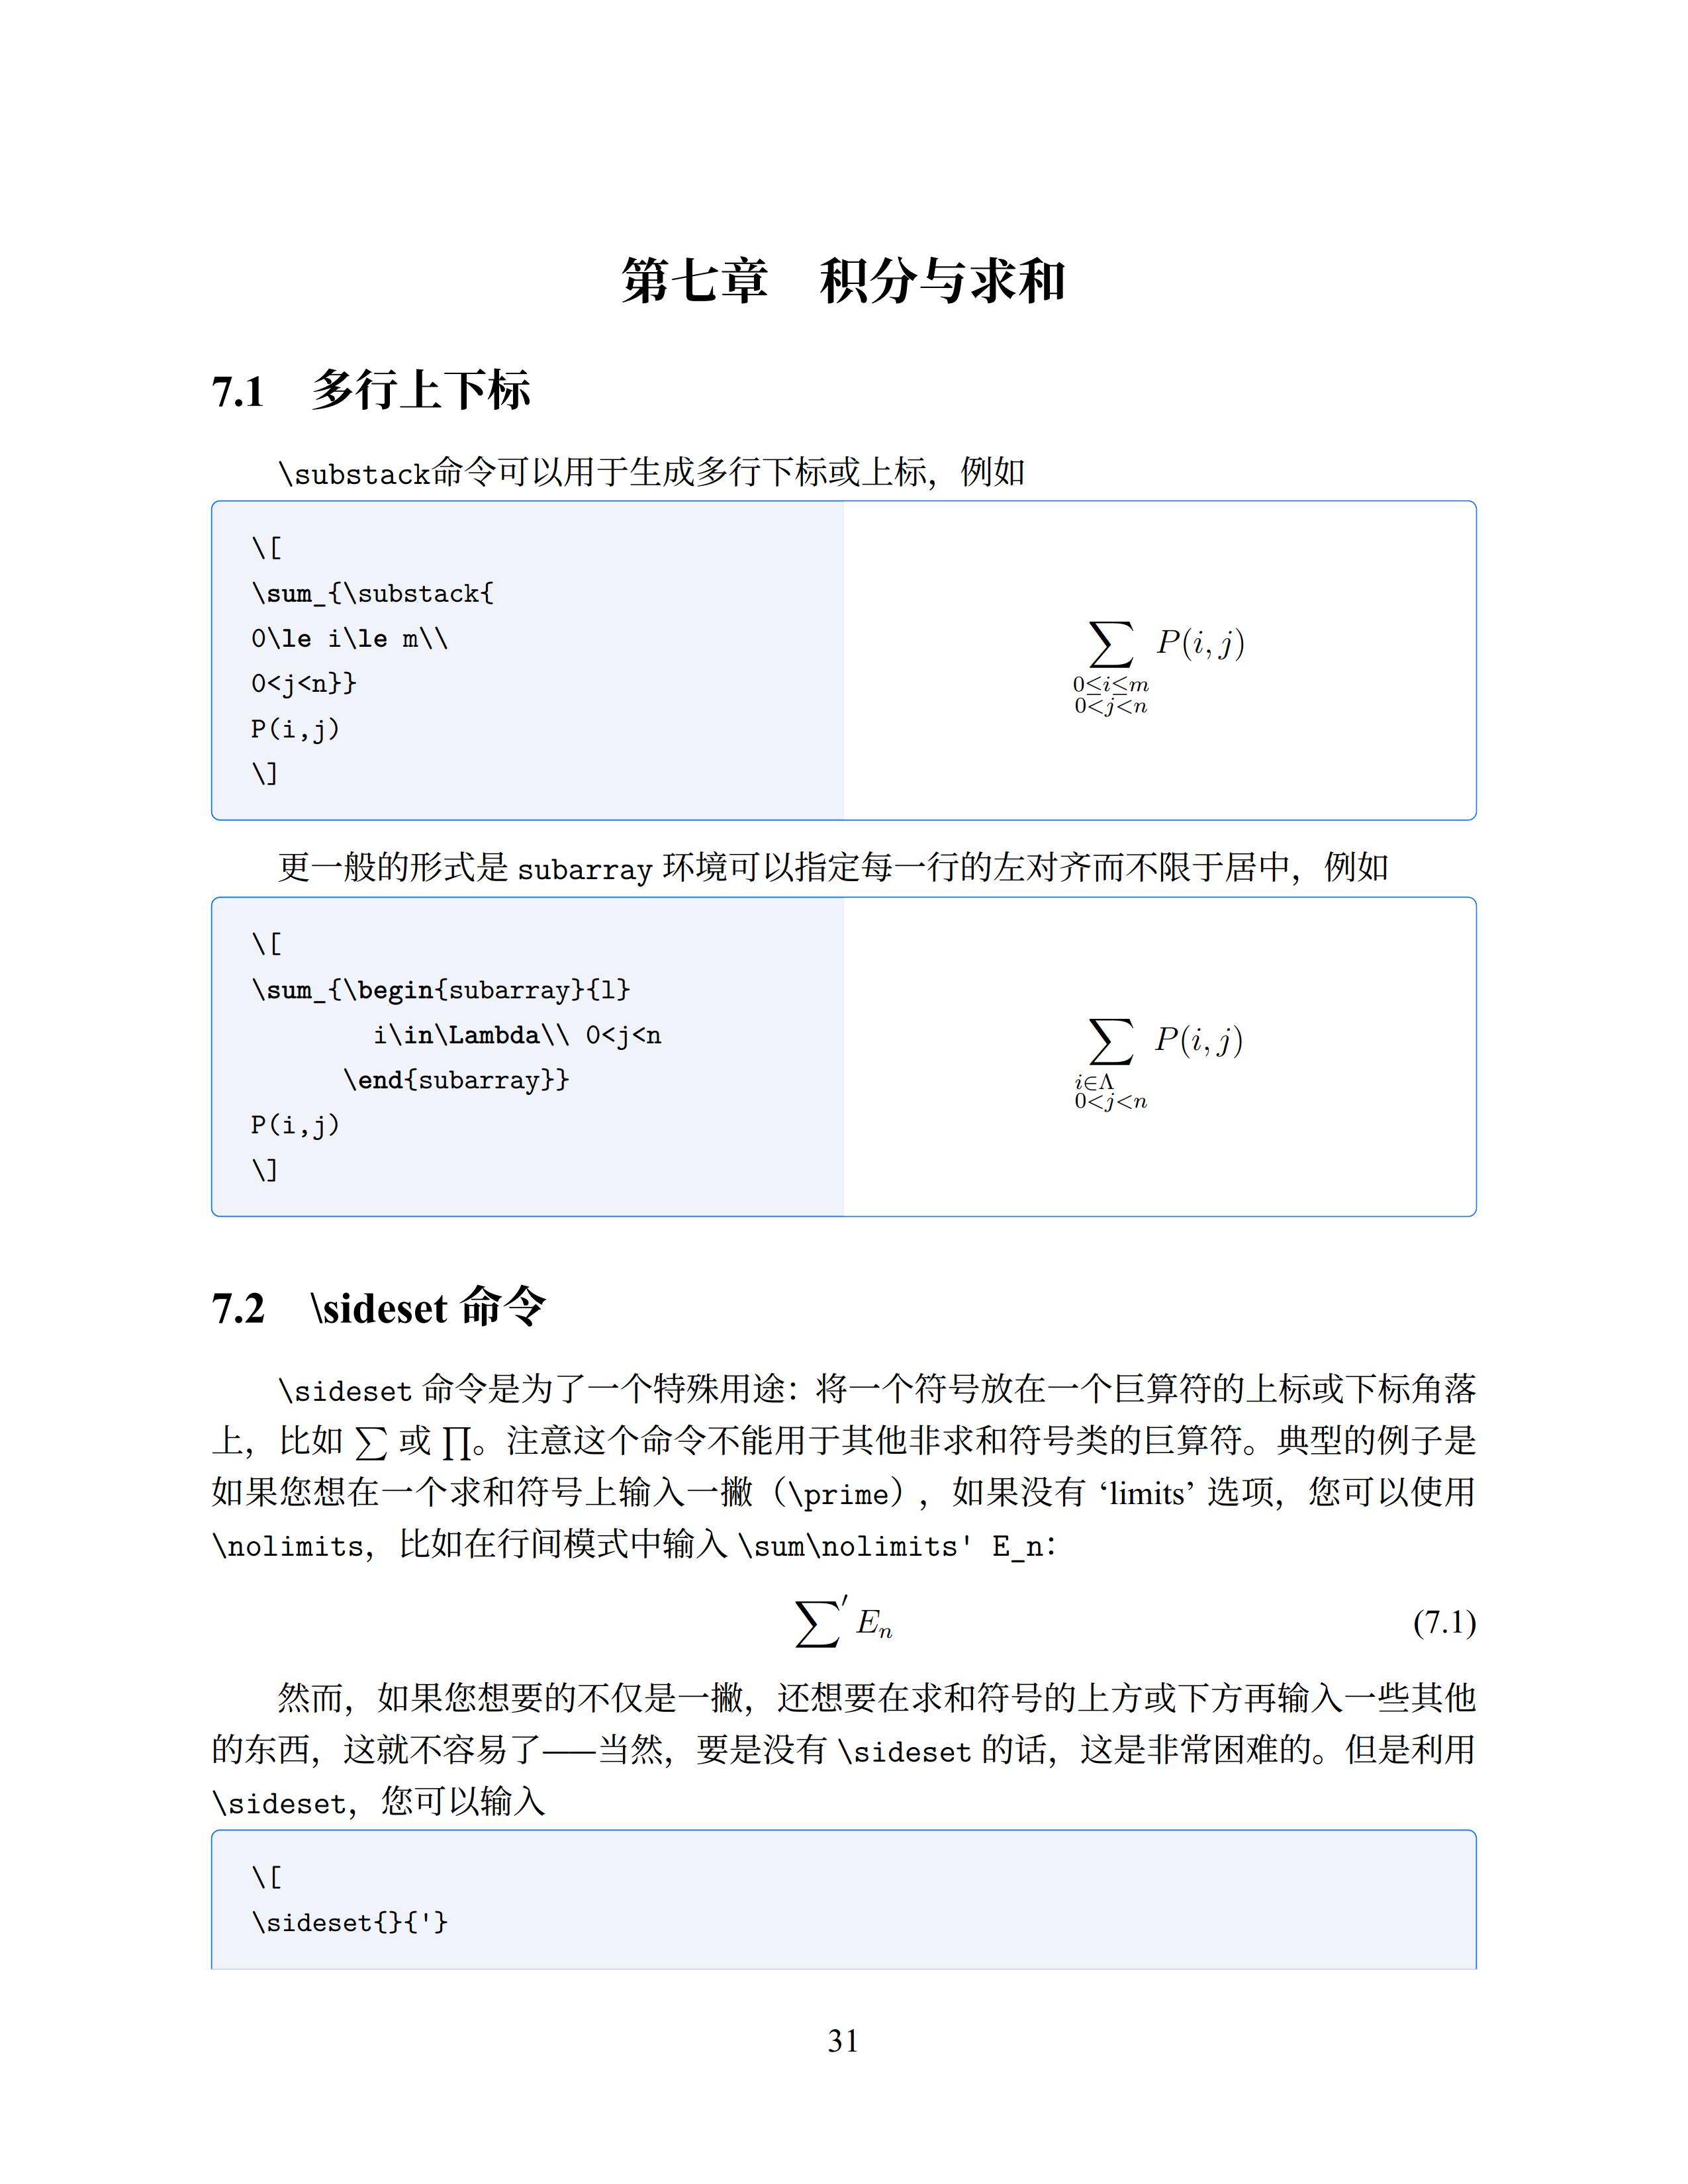 amsmath 宏包手册中文翻译 - 向禹老师出品